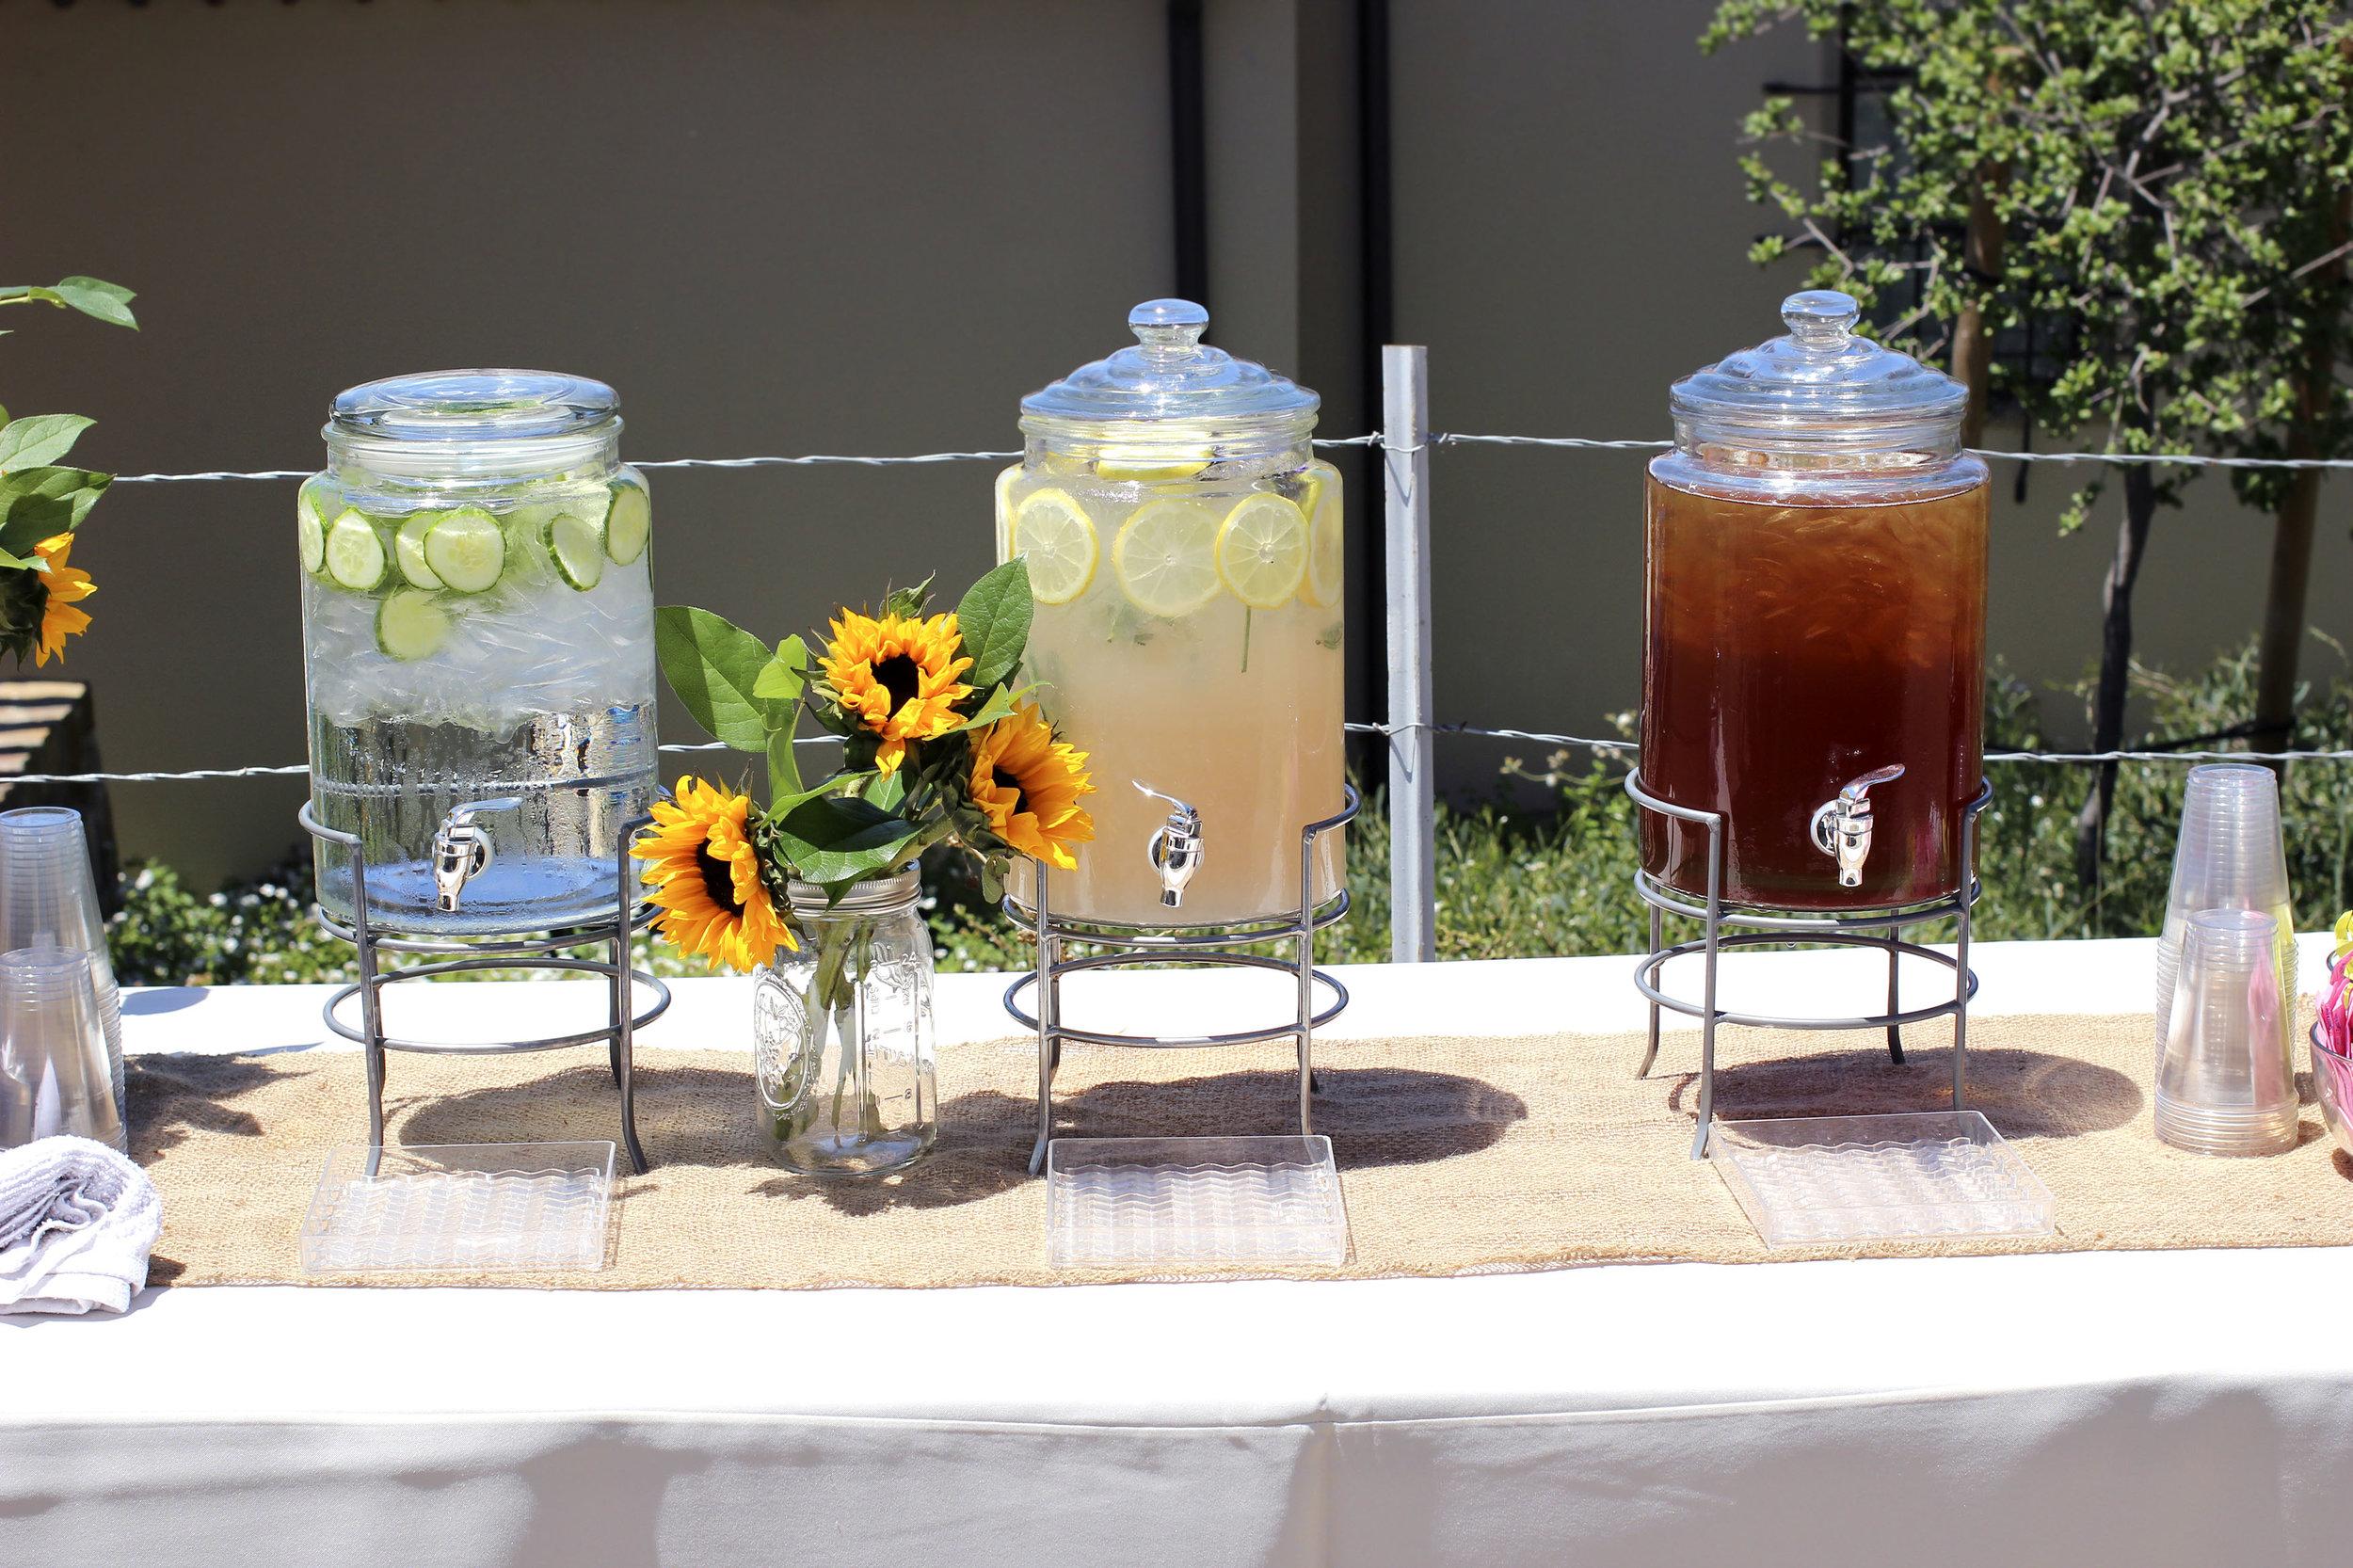 Cucumber water, Lavender Lemonade, Unsweetened Black Iced Tea